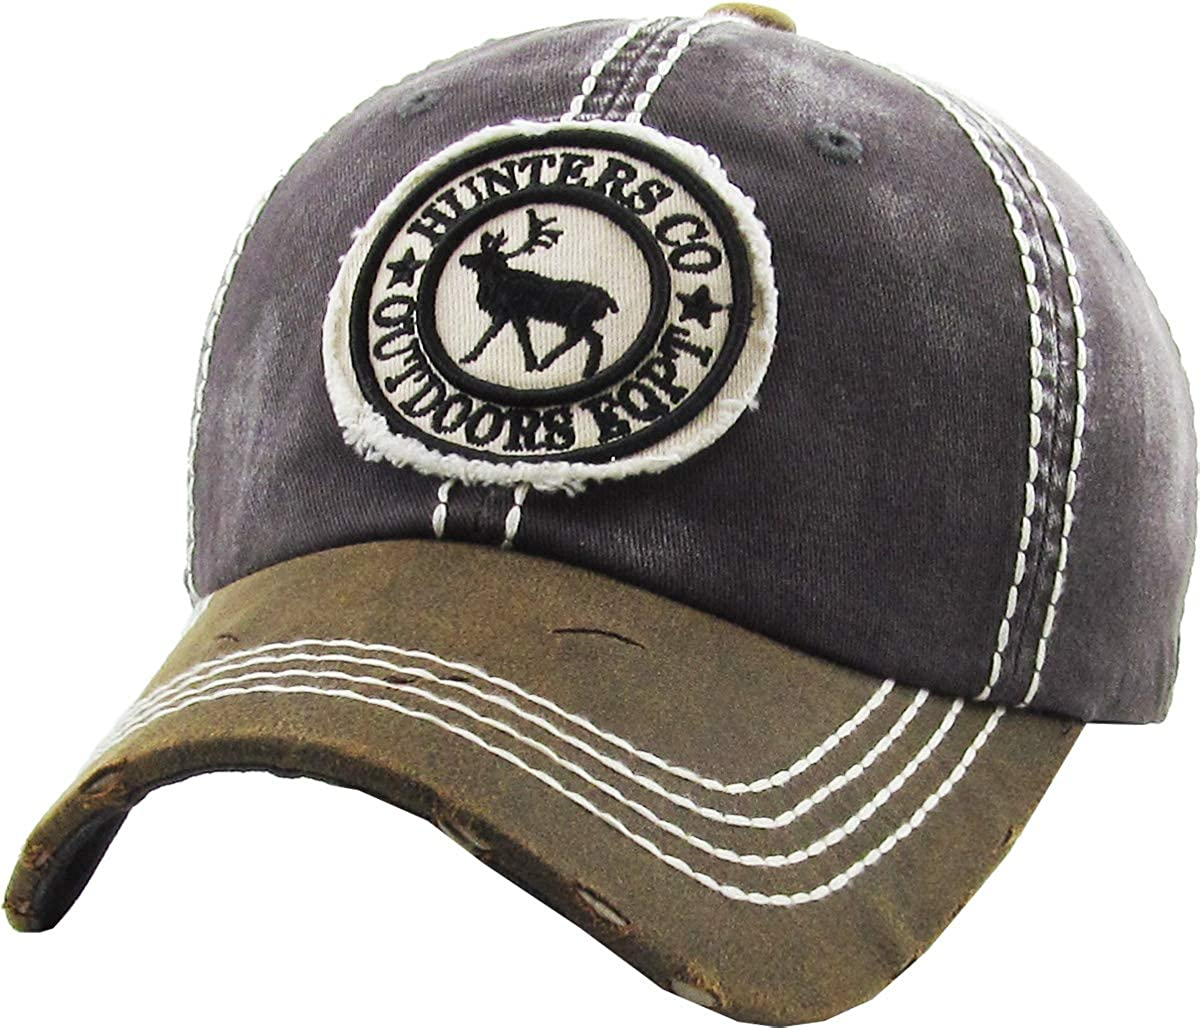 KBETHOS Outdoor Hunting Tactical Distressed Baseball Cap Dad Hats Adjustable Unisex